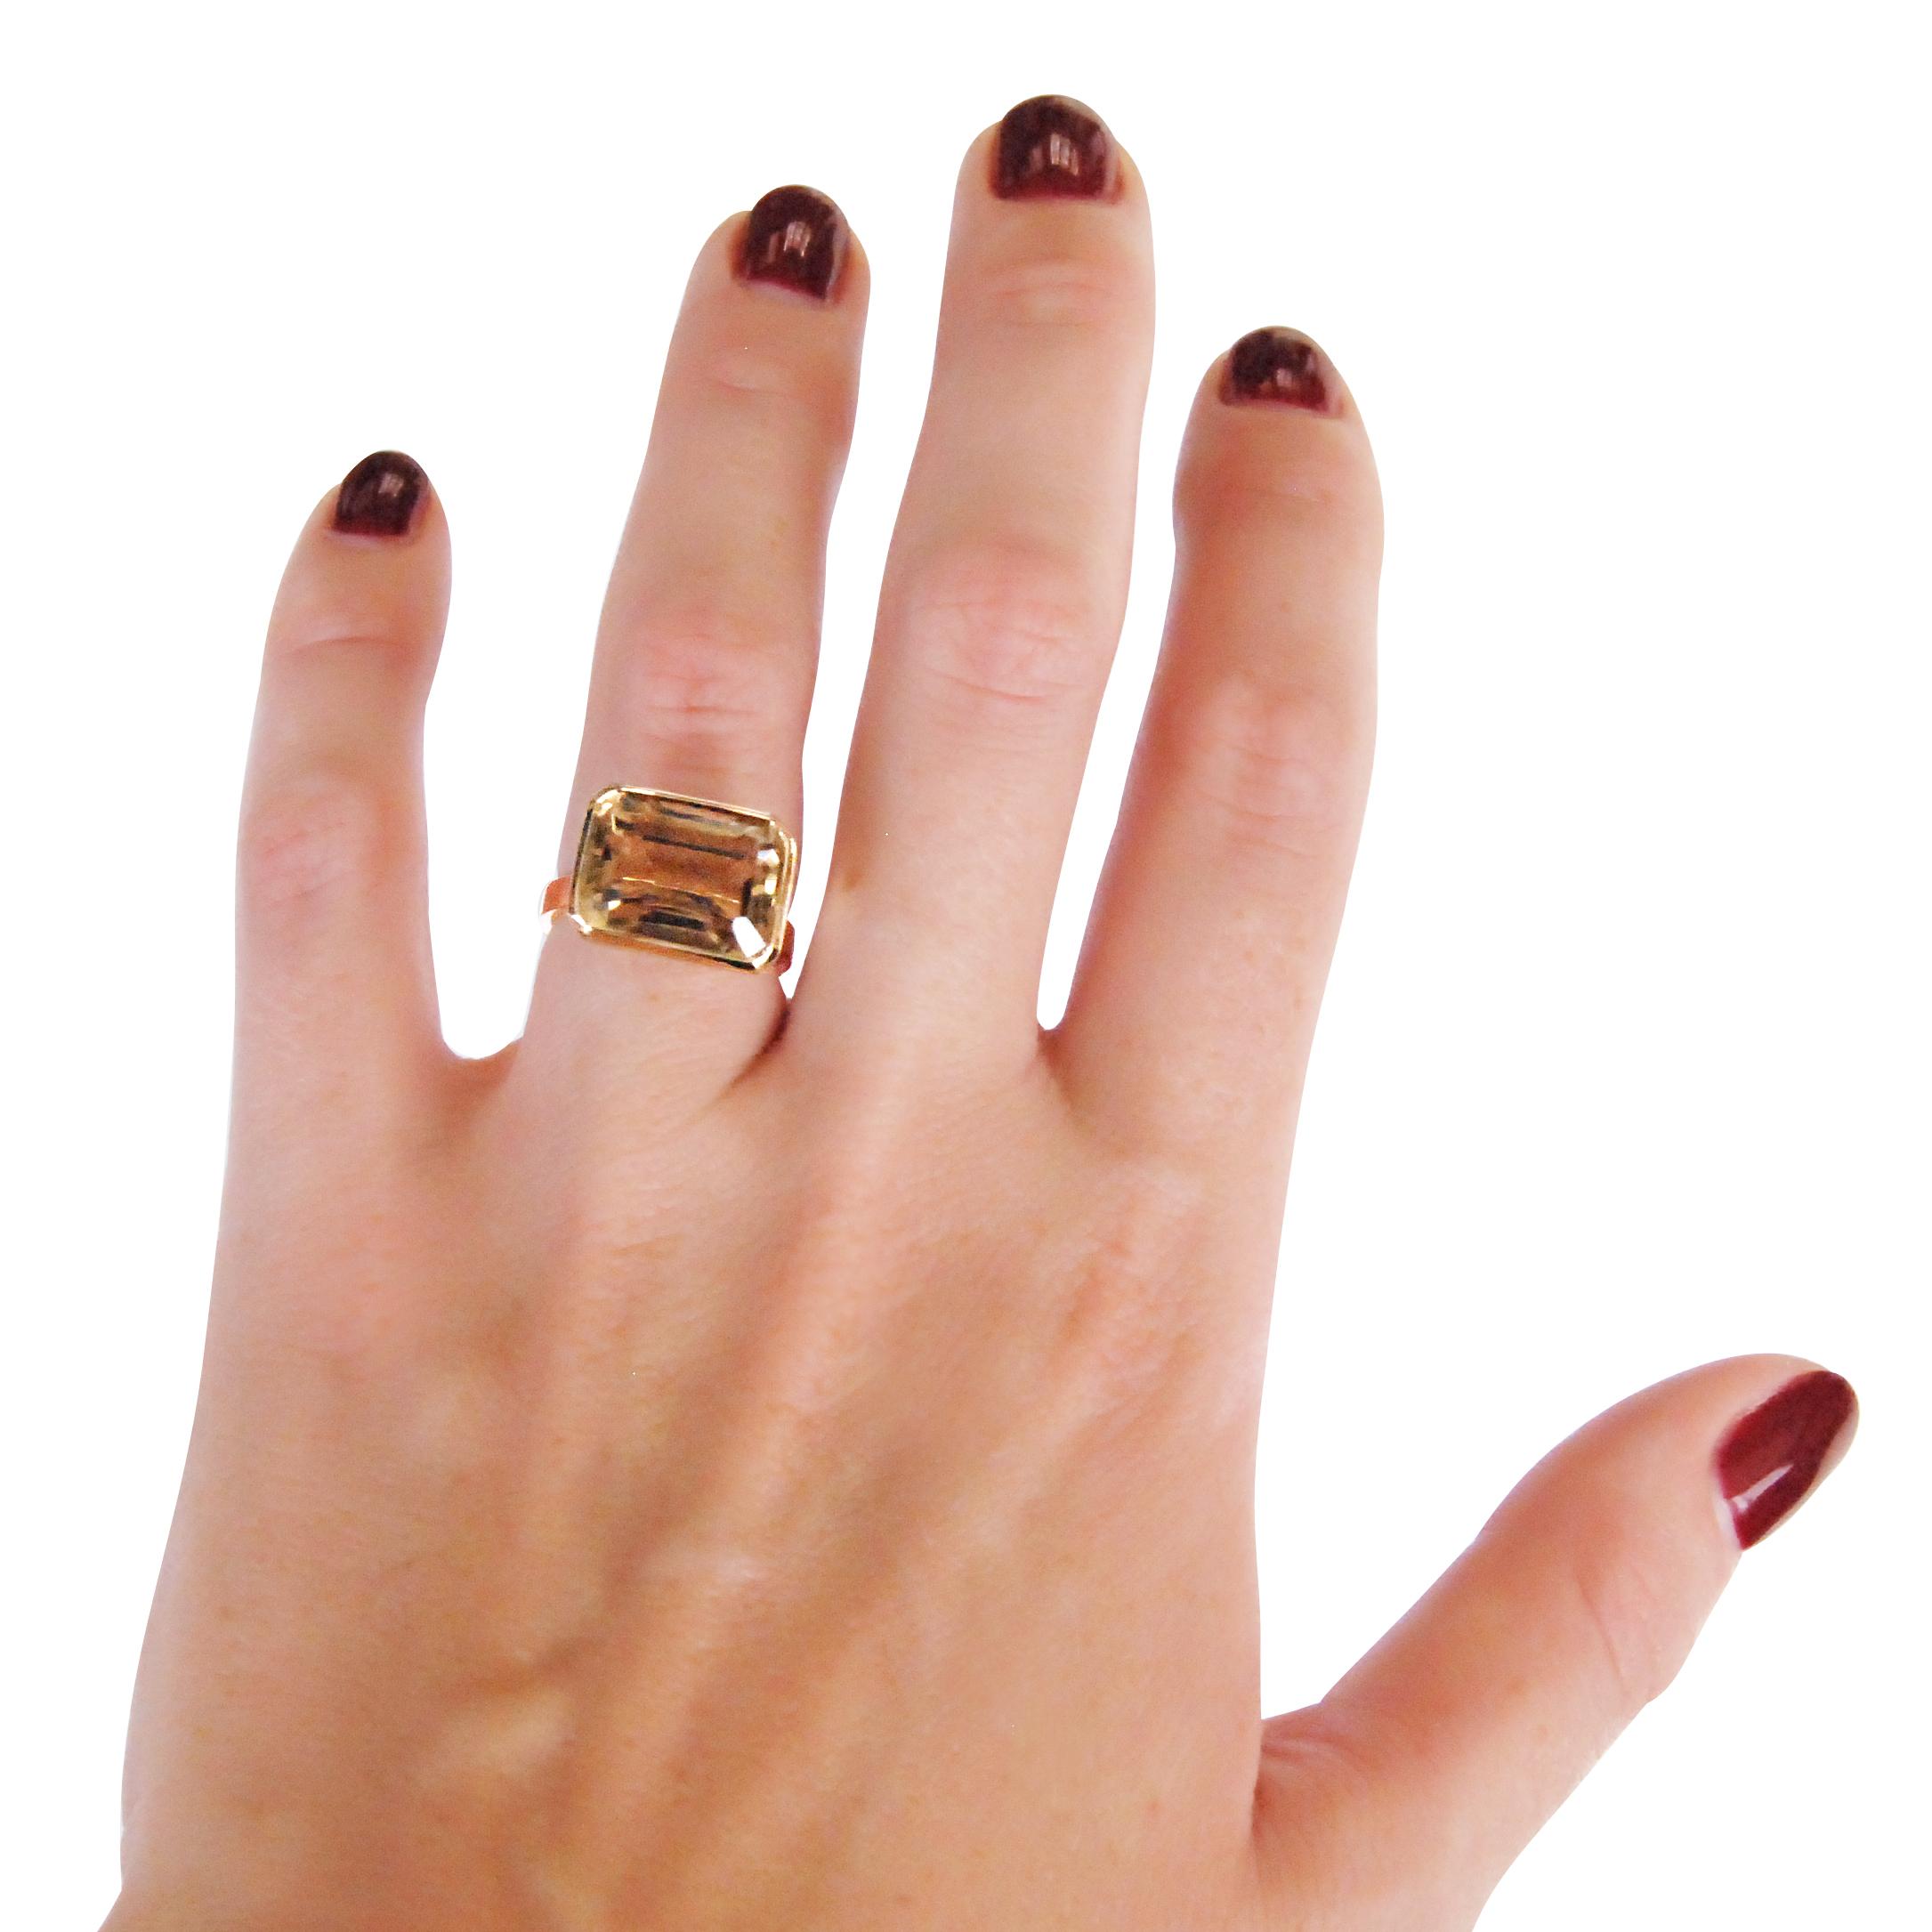 Smoky-quartz-and-yellow-gold-ring-1.jpg